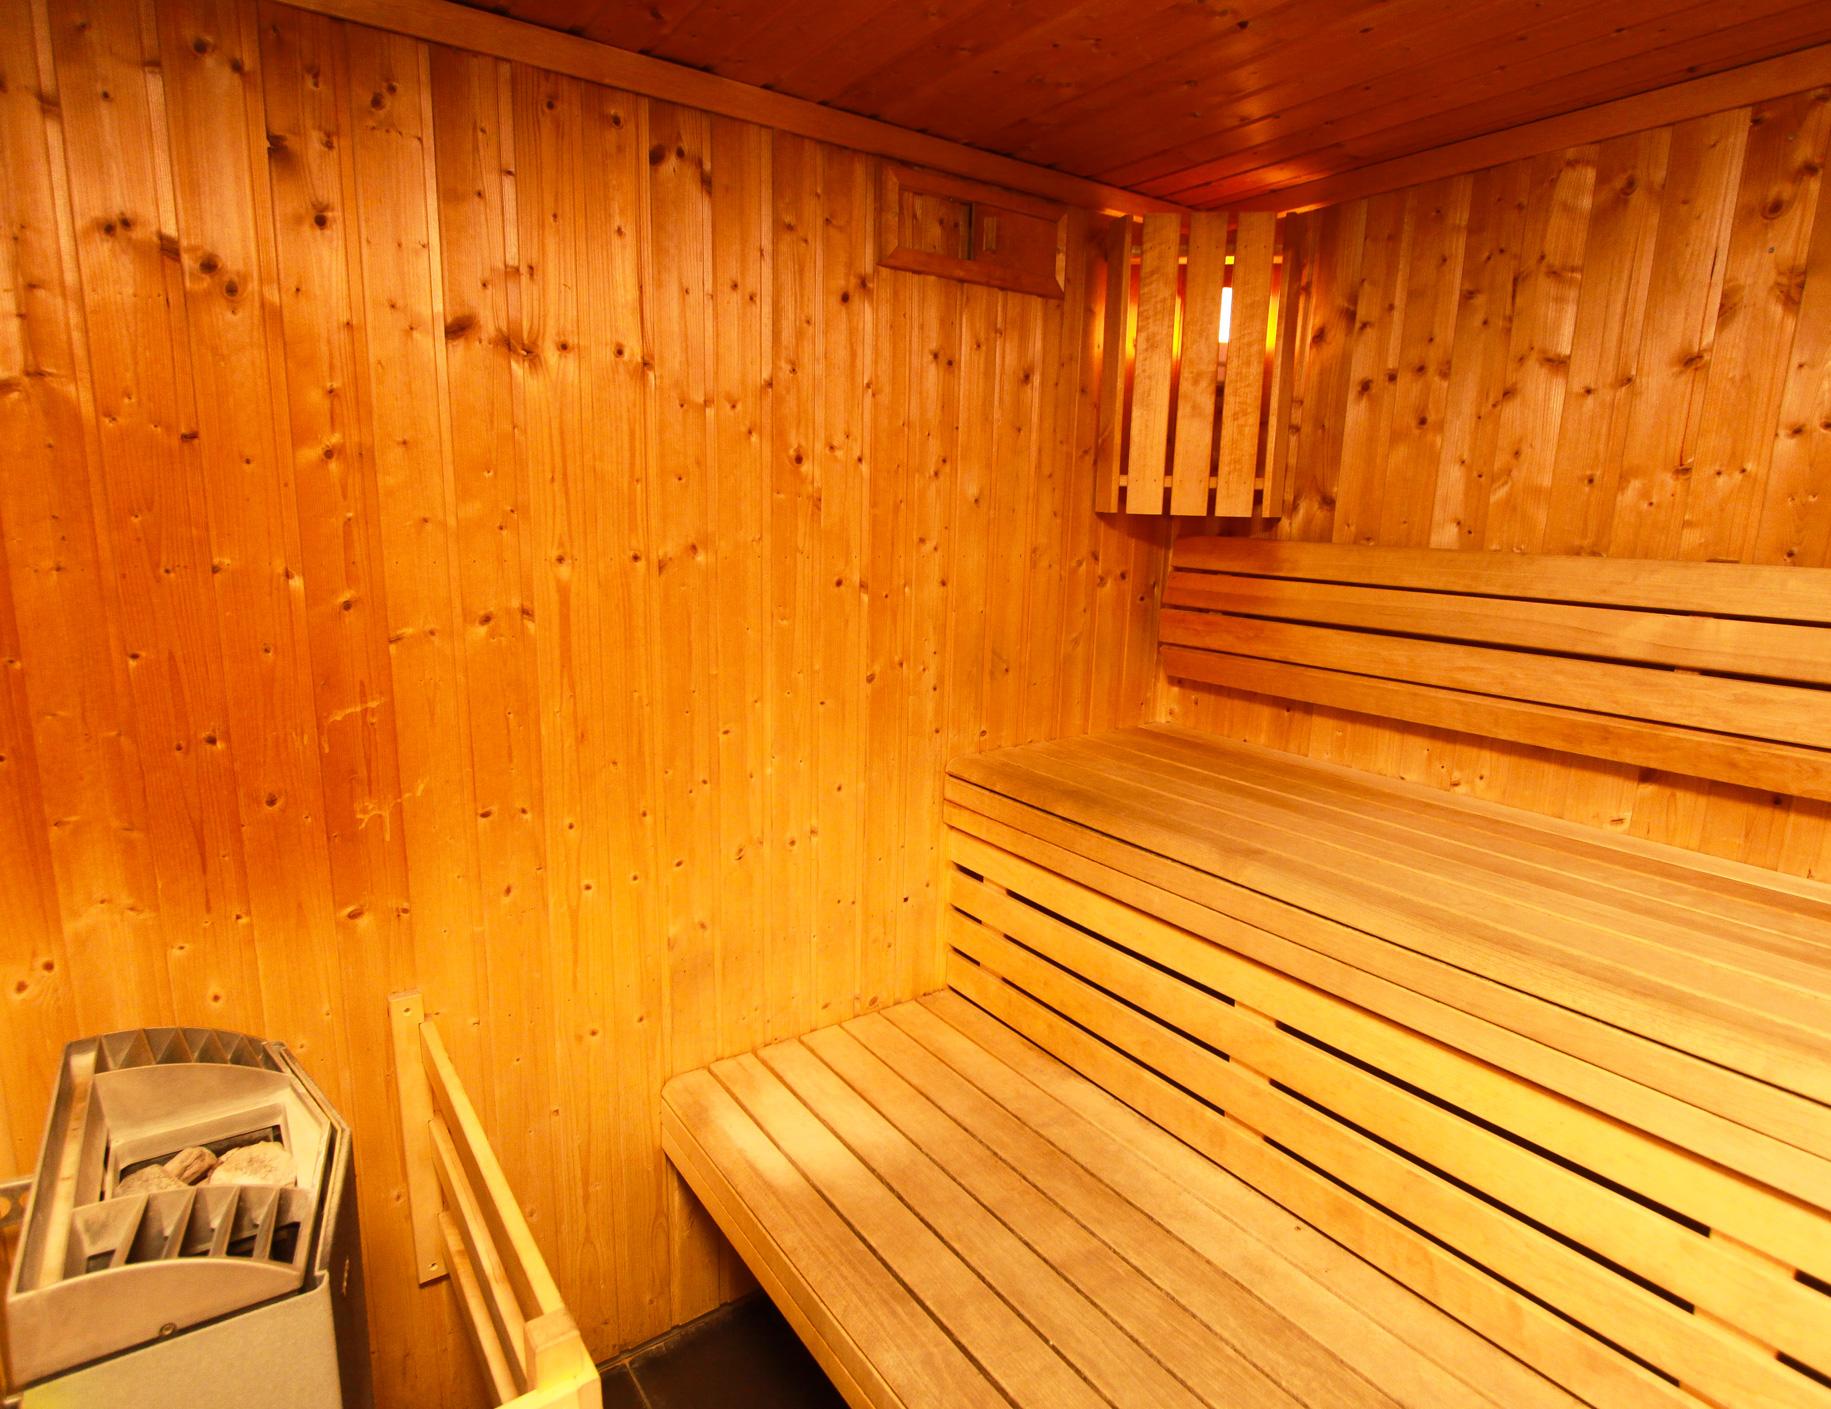 D tente et sauna tempofitness for Sauna la detente